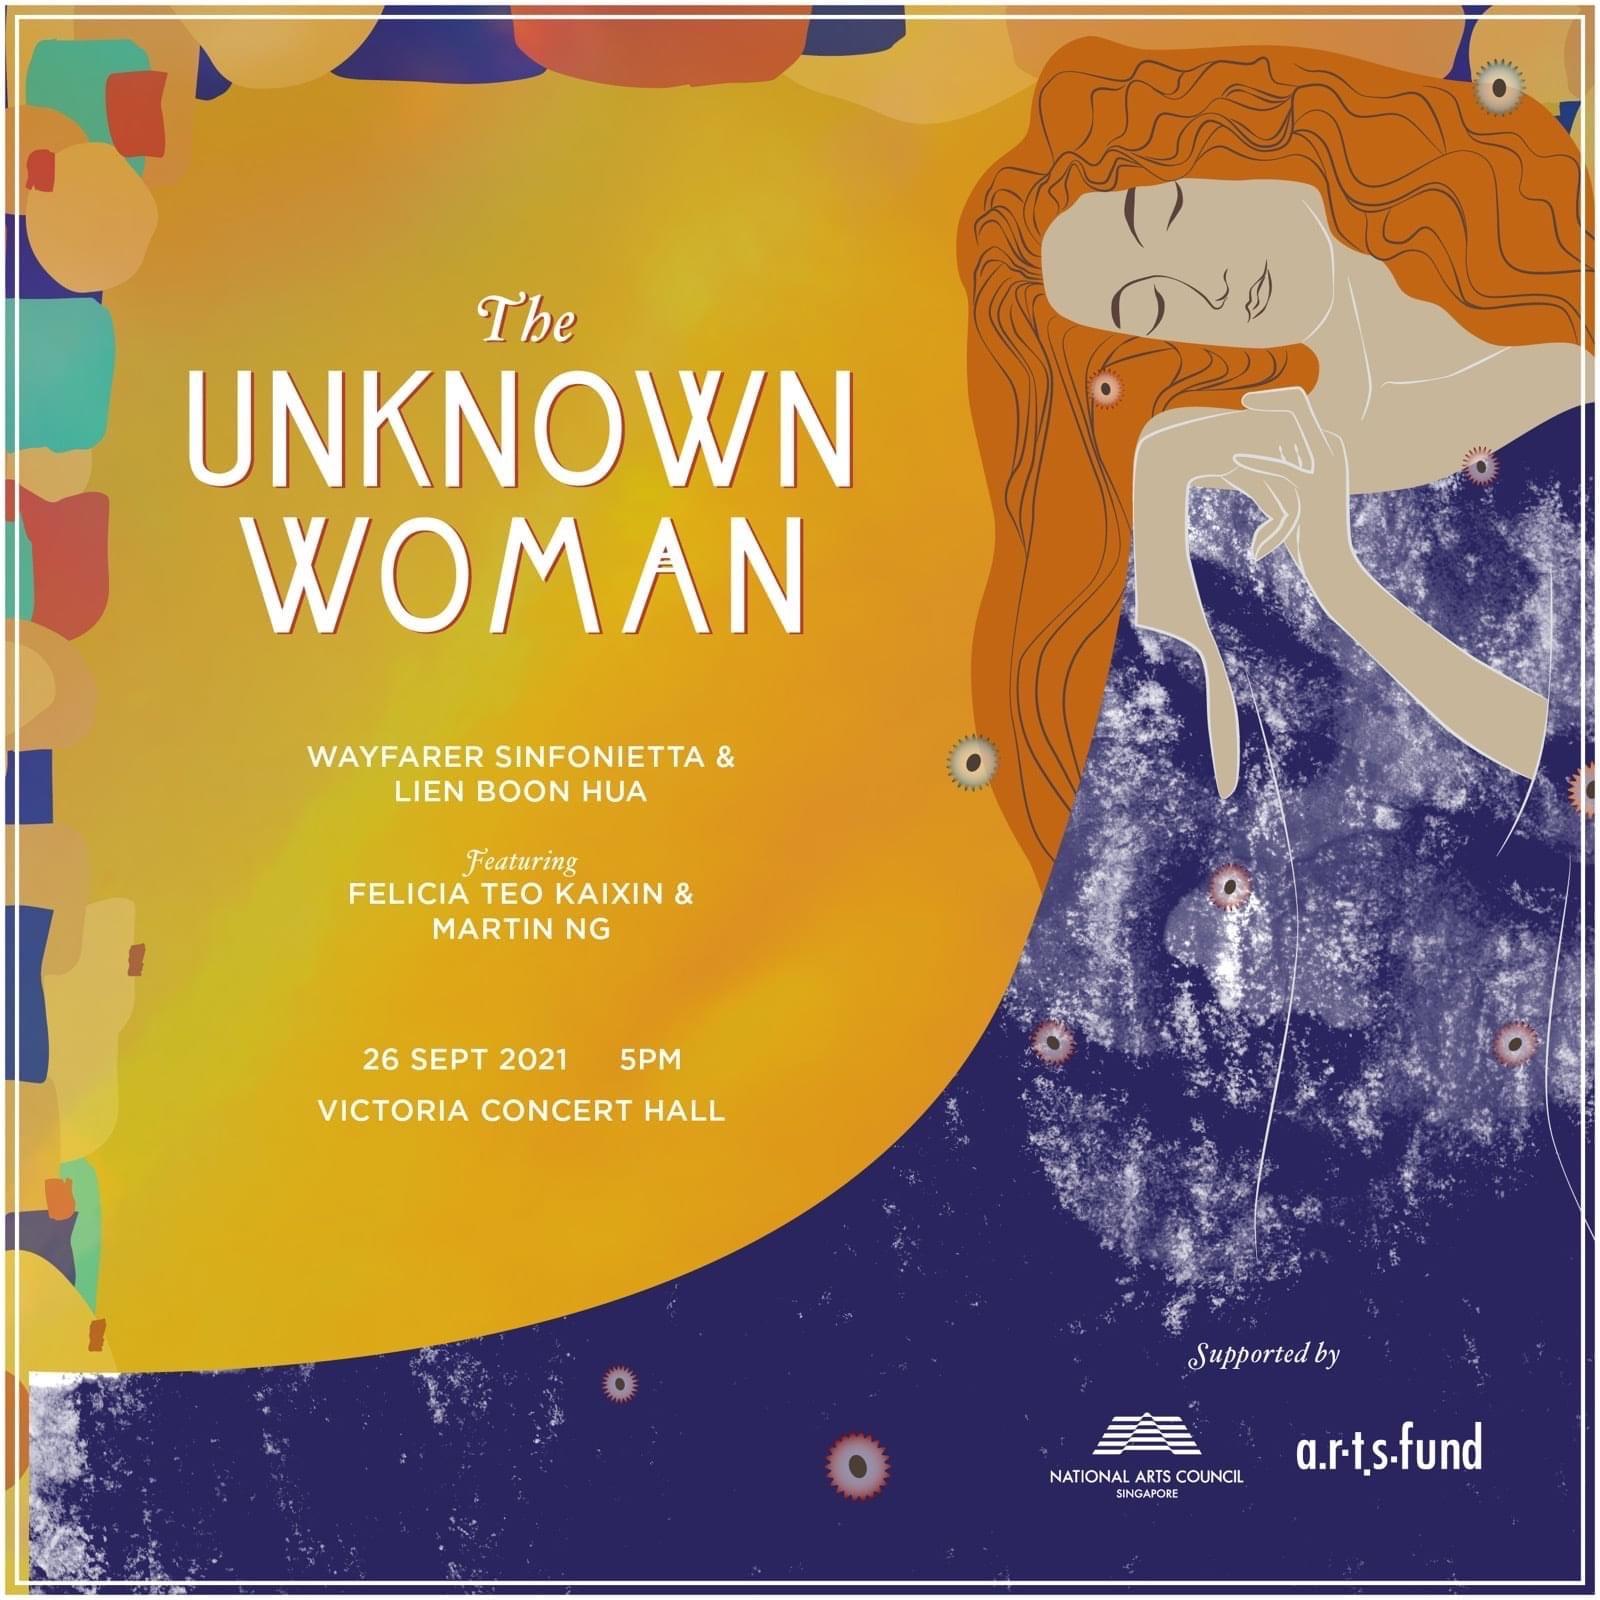 THE UNKNOWN WOMEN, by Wayfarer Sinfonietta, featuring Felicia Teo Kaixin & Martin Ng